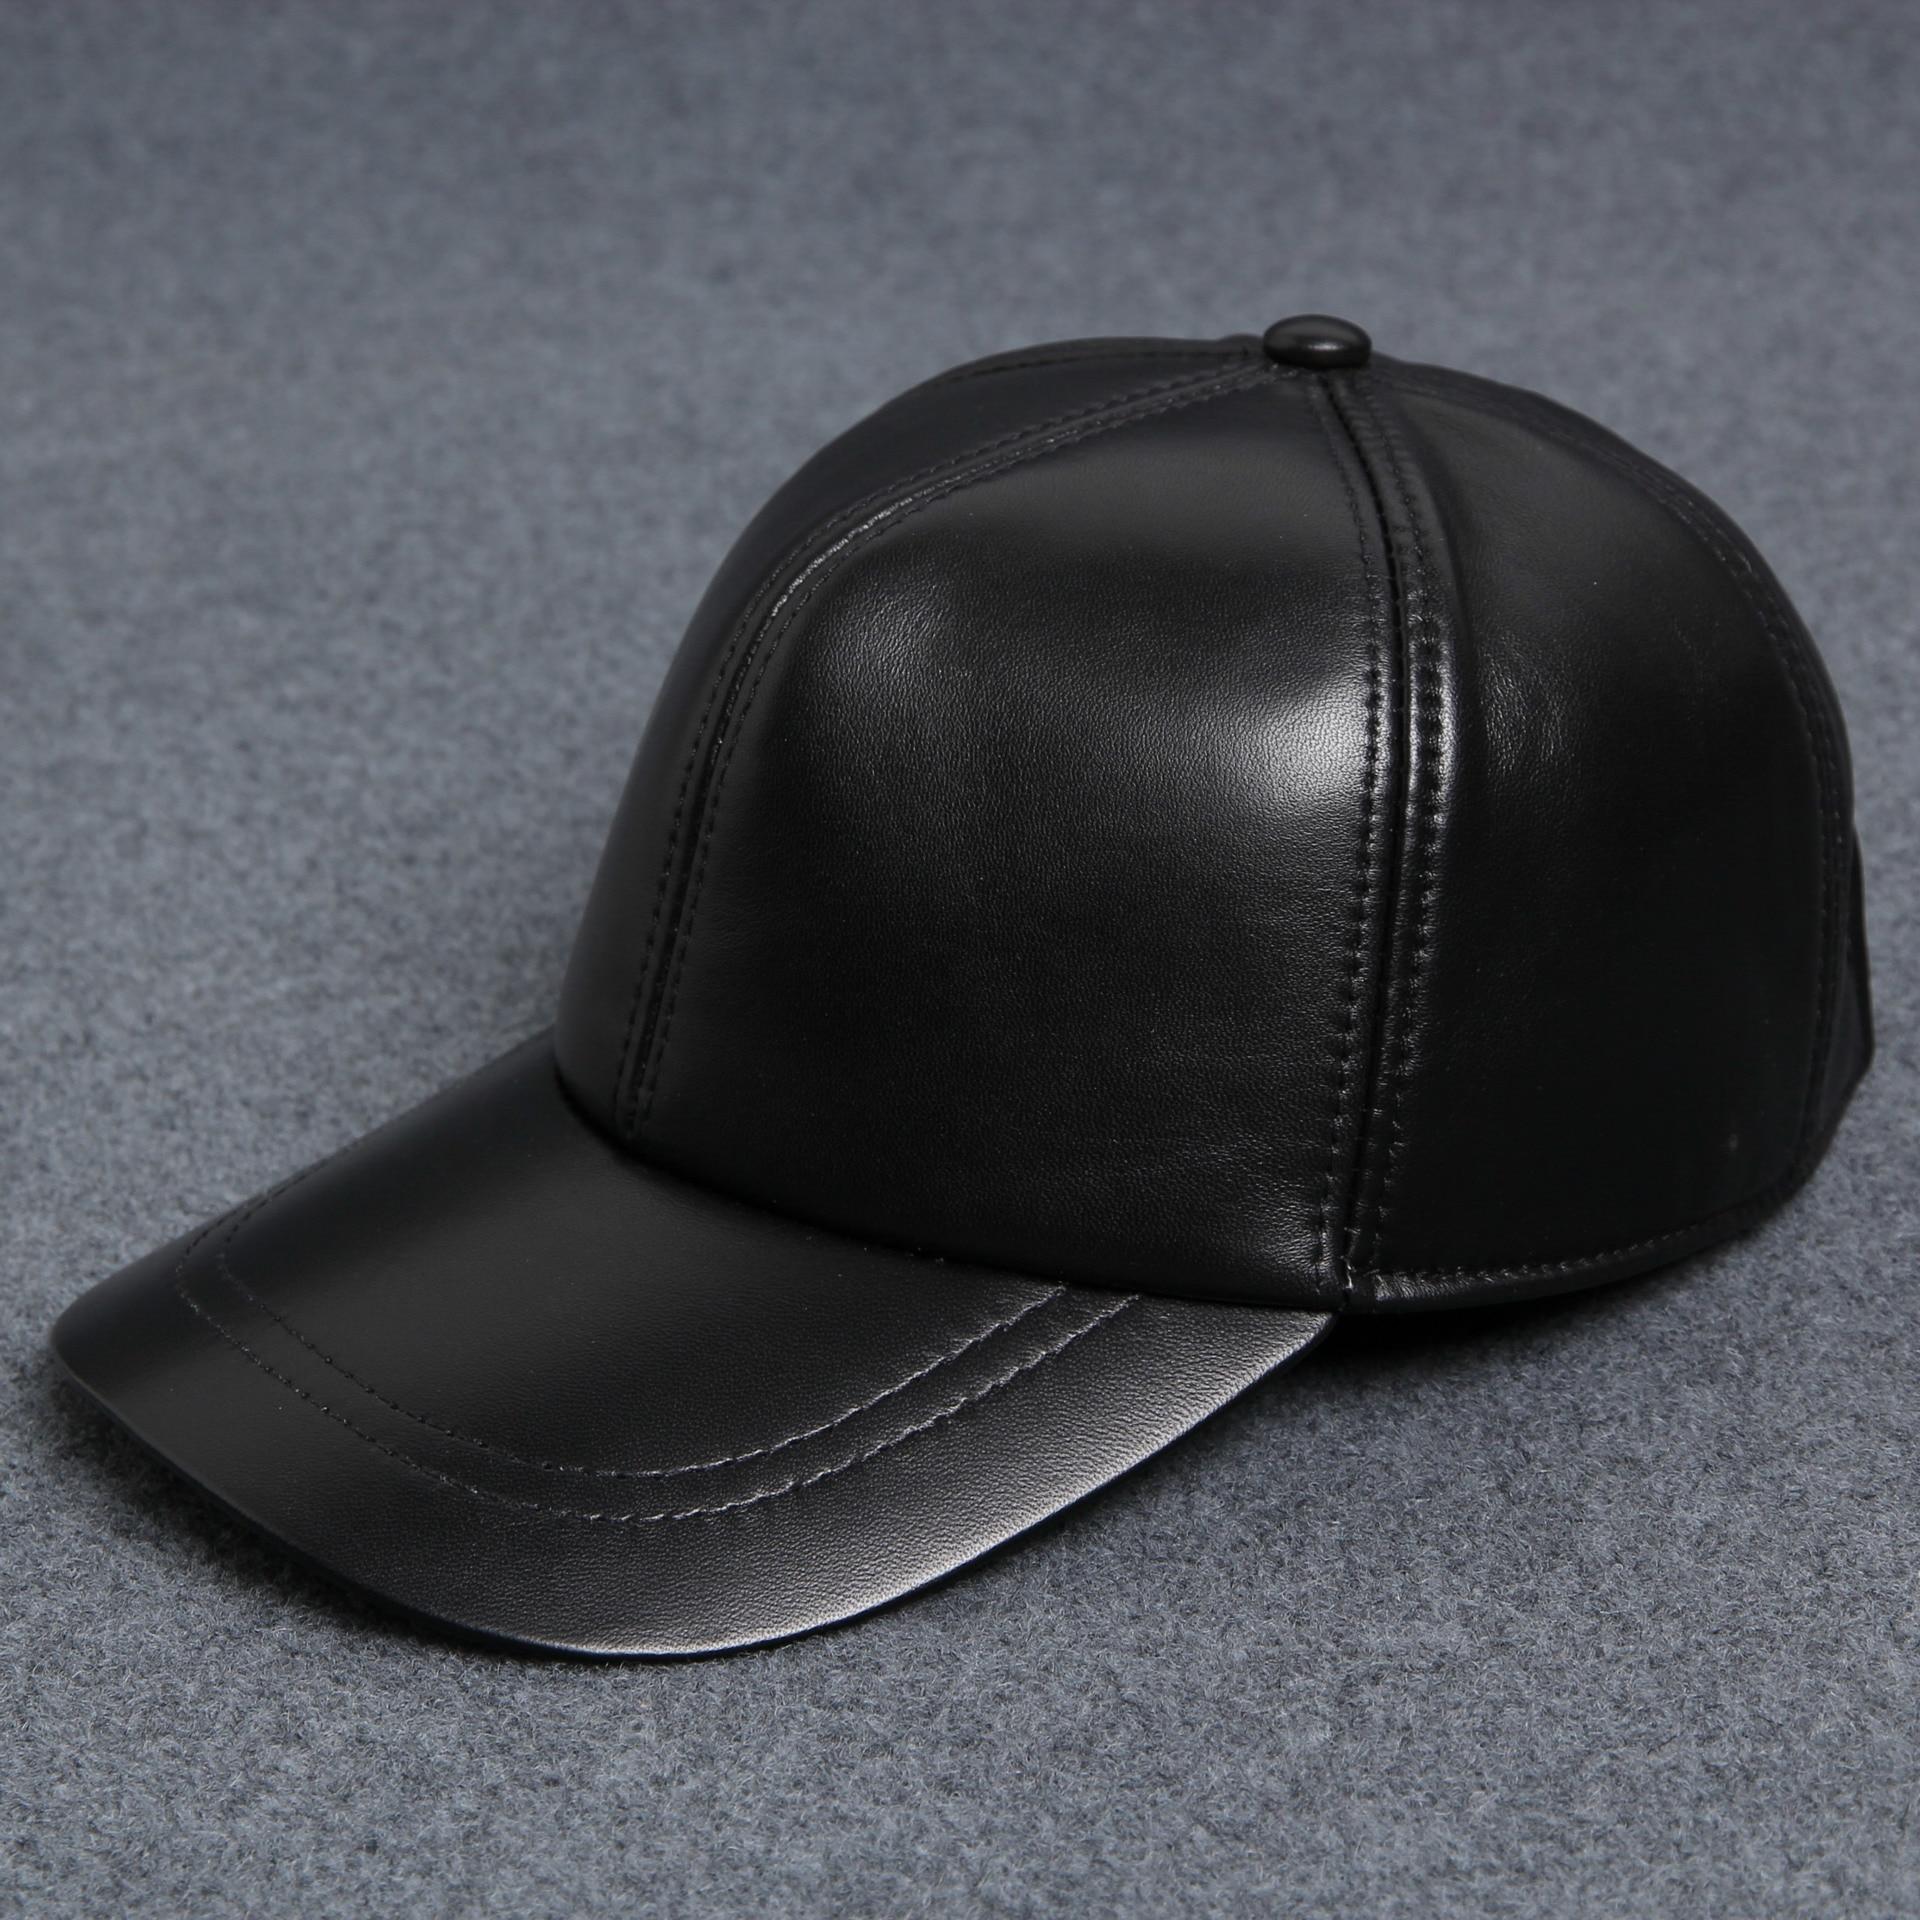 Black Caps Baseball-Cap Dad Hat Sports Fashion Men's Solid Casual Elderly